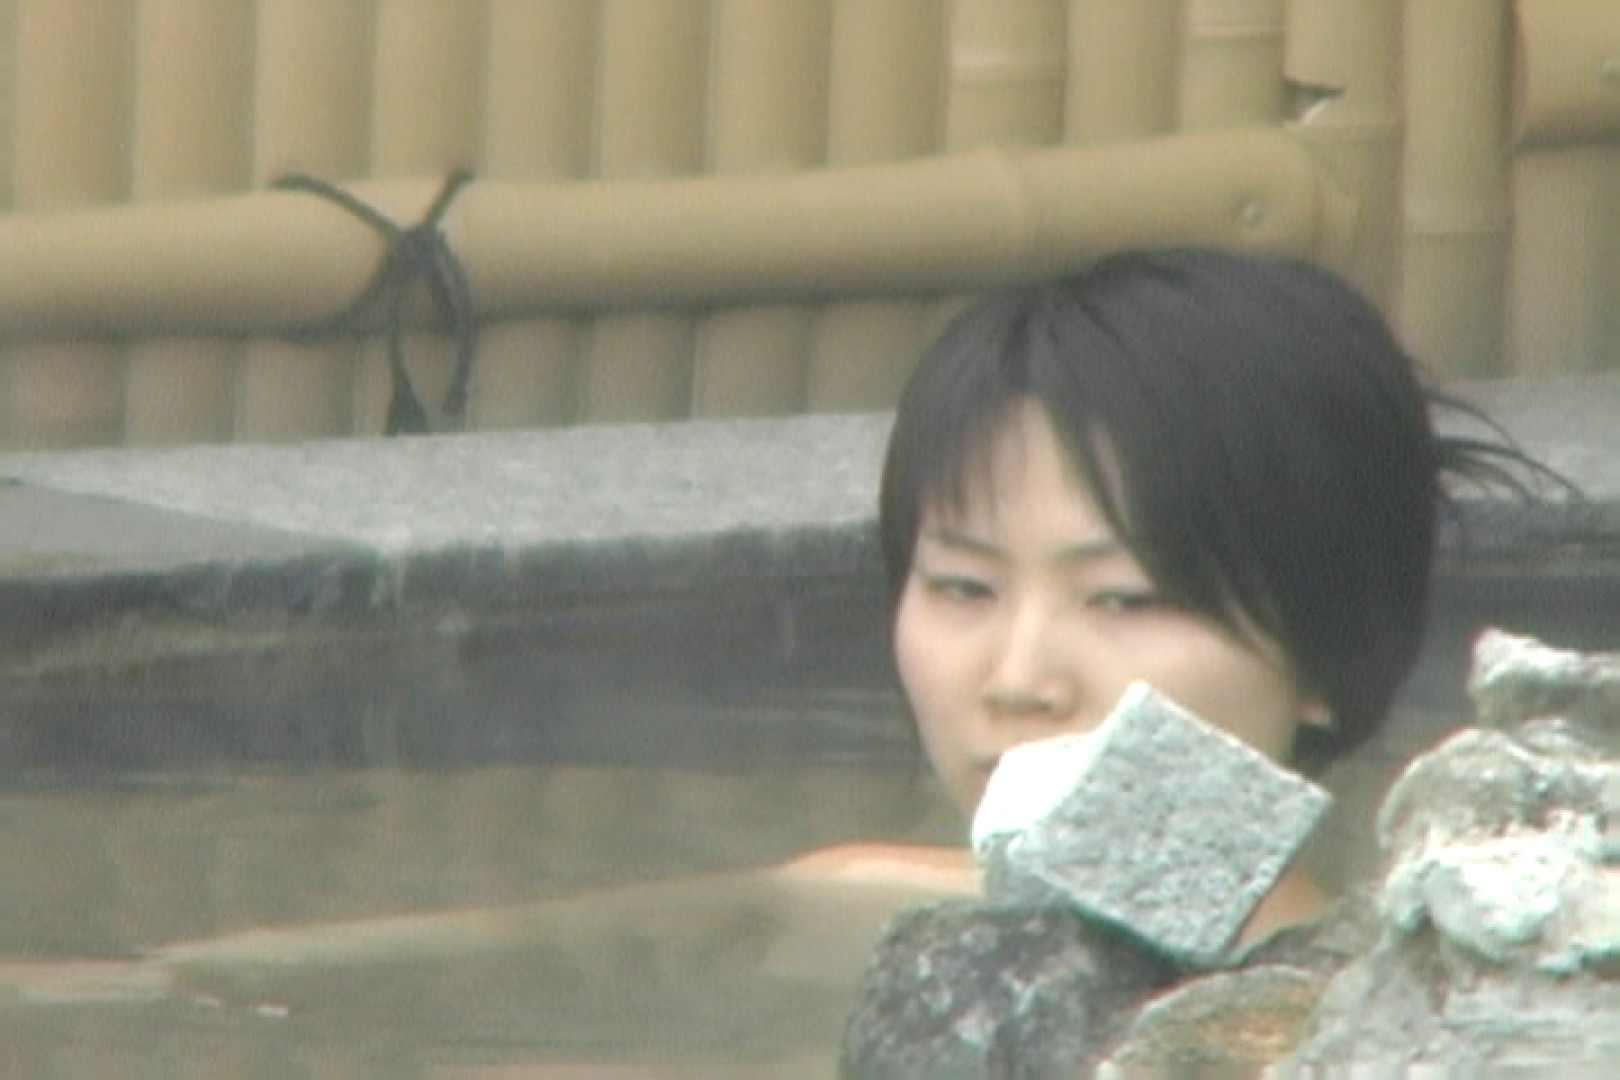 Aquaな露天風呂Vol.567 盗撮  96連発 42